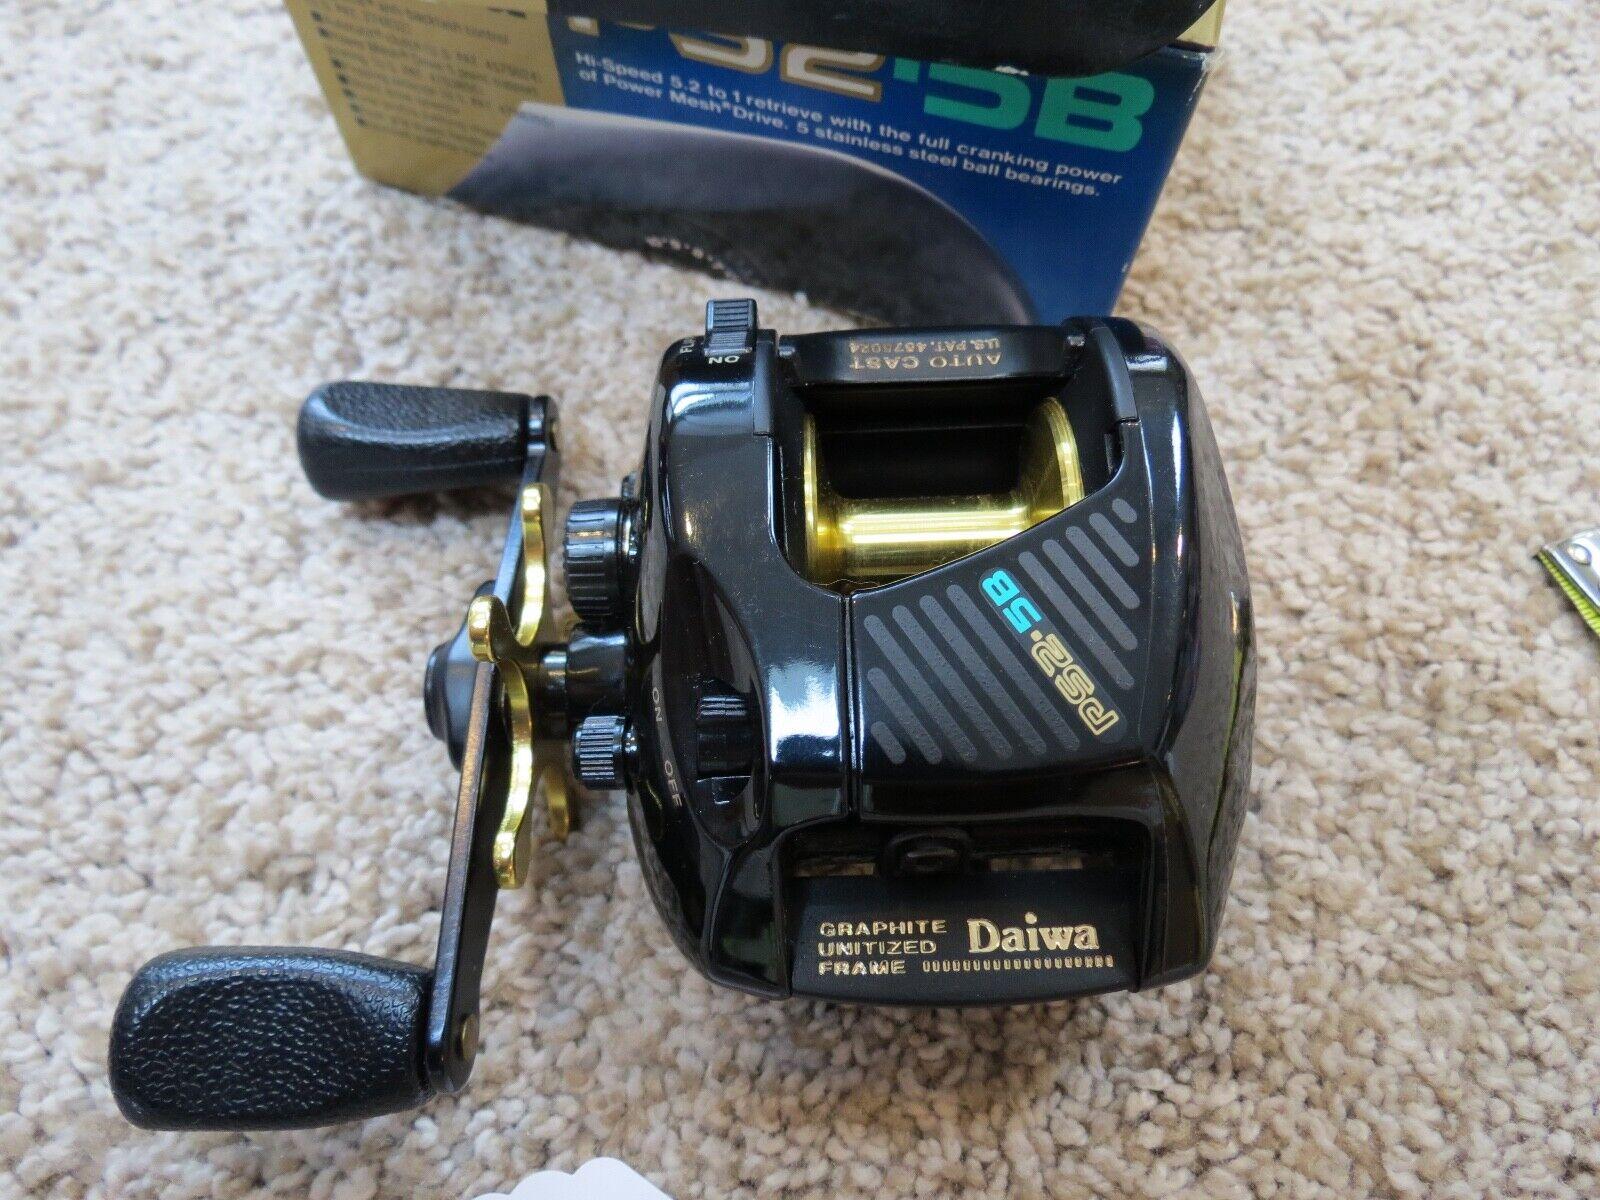 Daiwa PS2 5B fishing reel made in Japan never used lot 13078